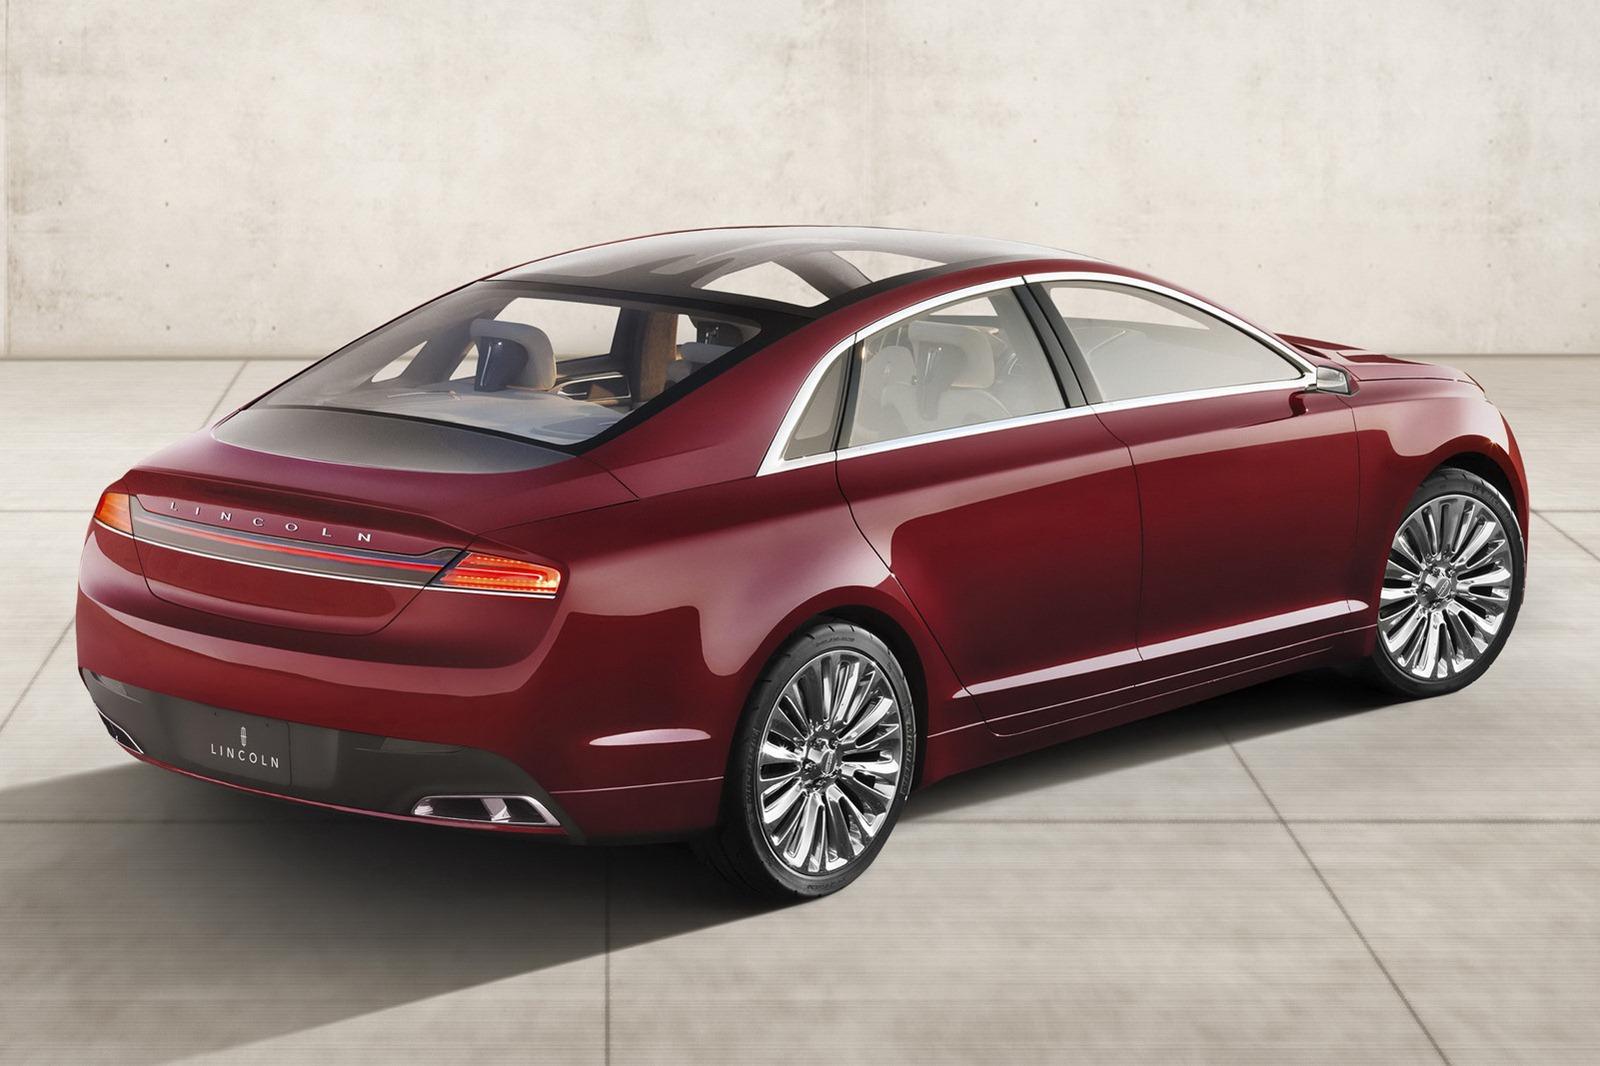 Lincoln Mkz Concept 2017 3 Jpg